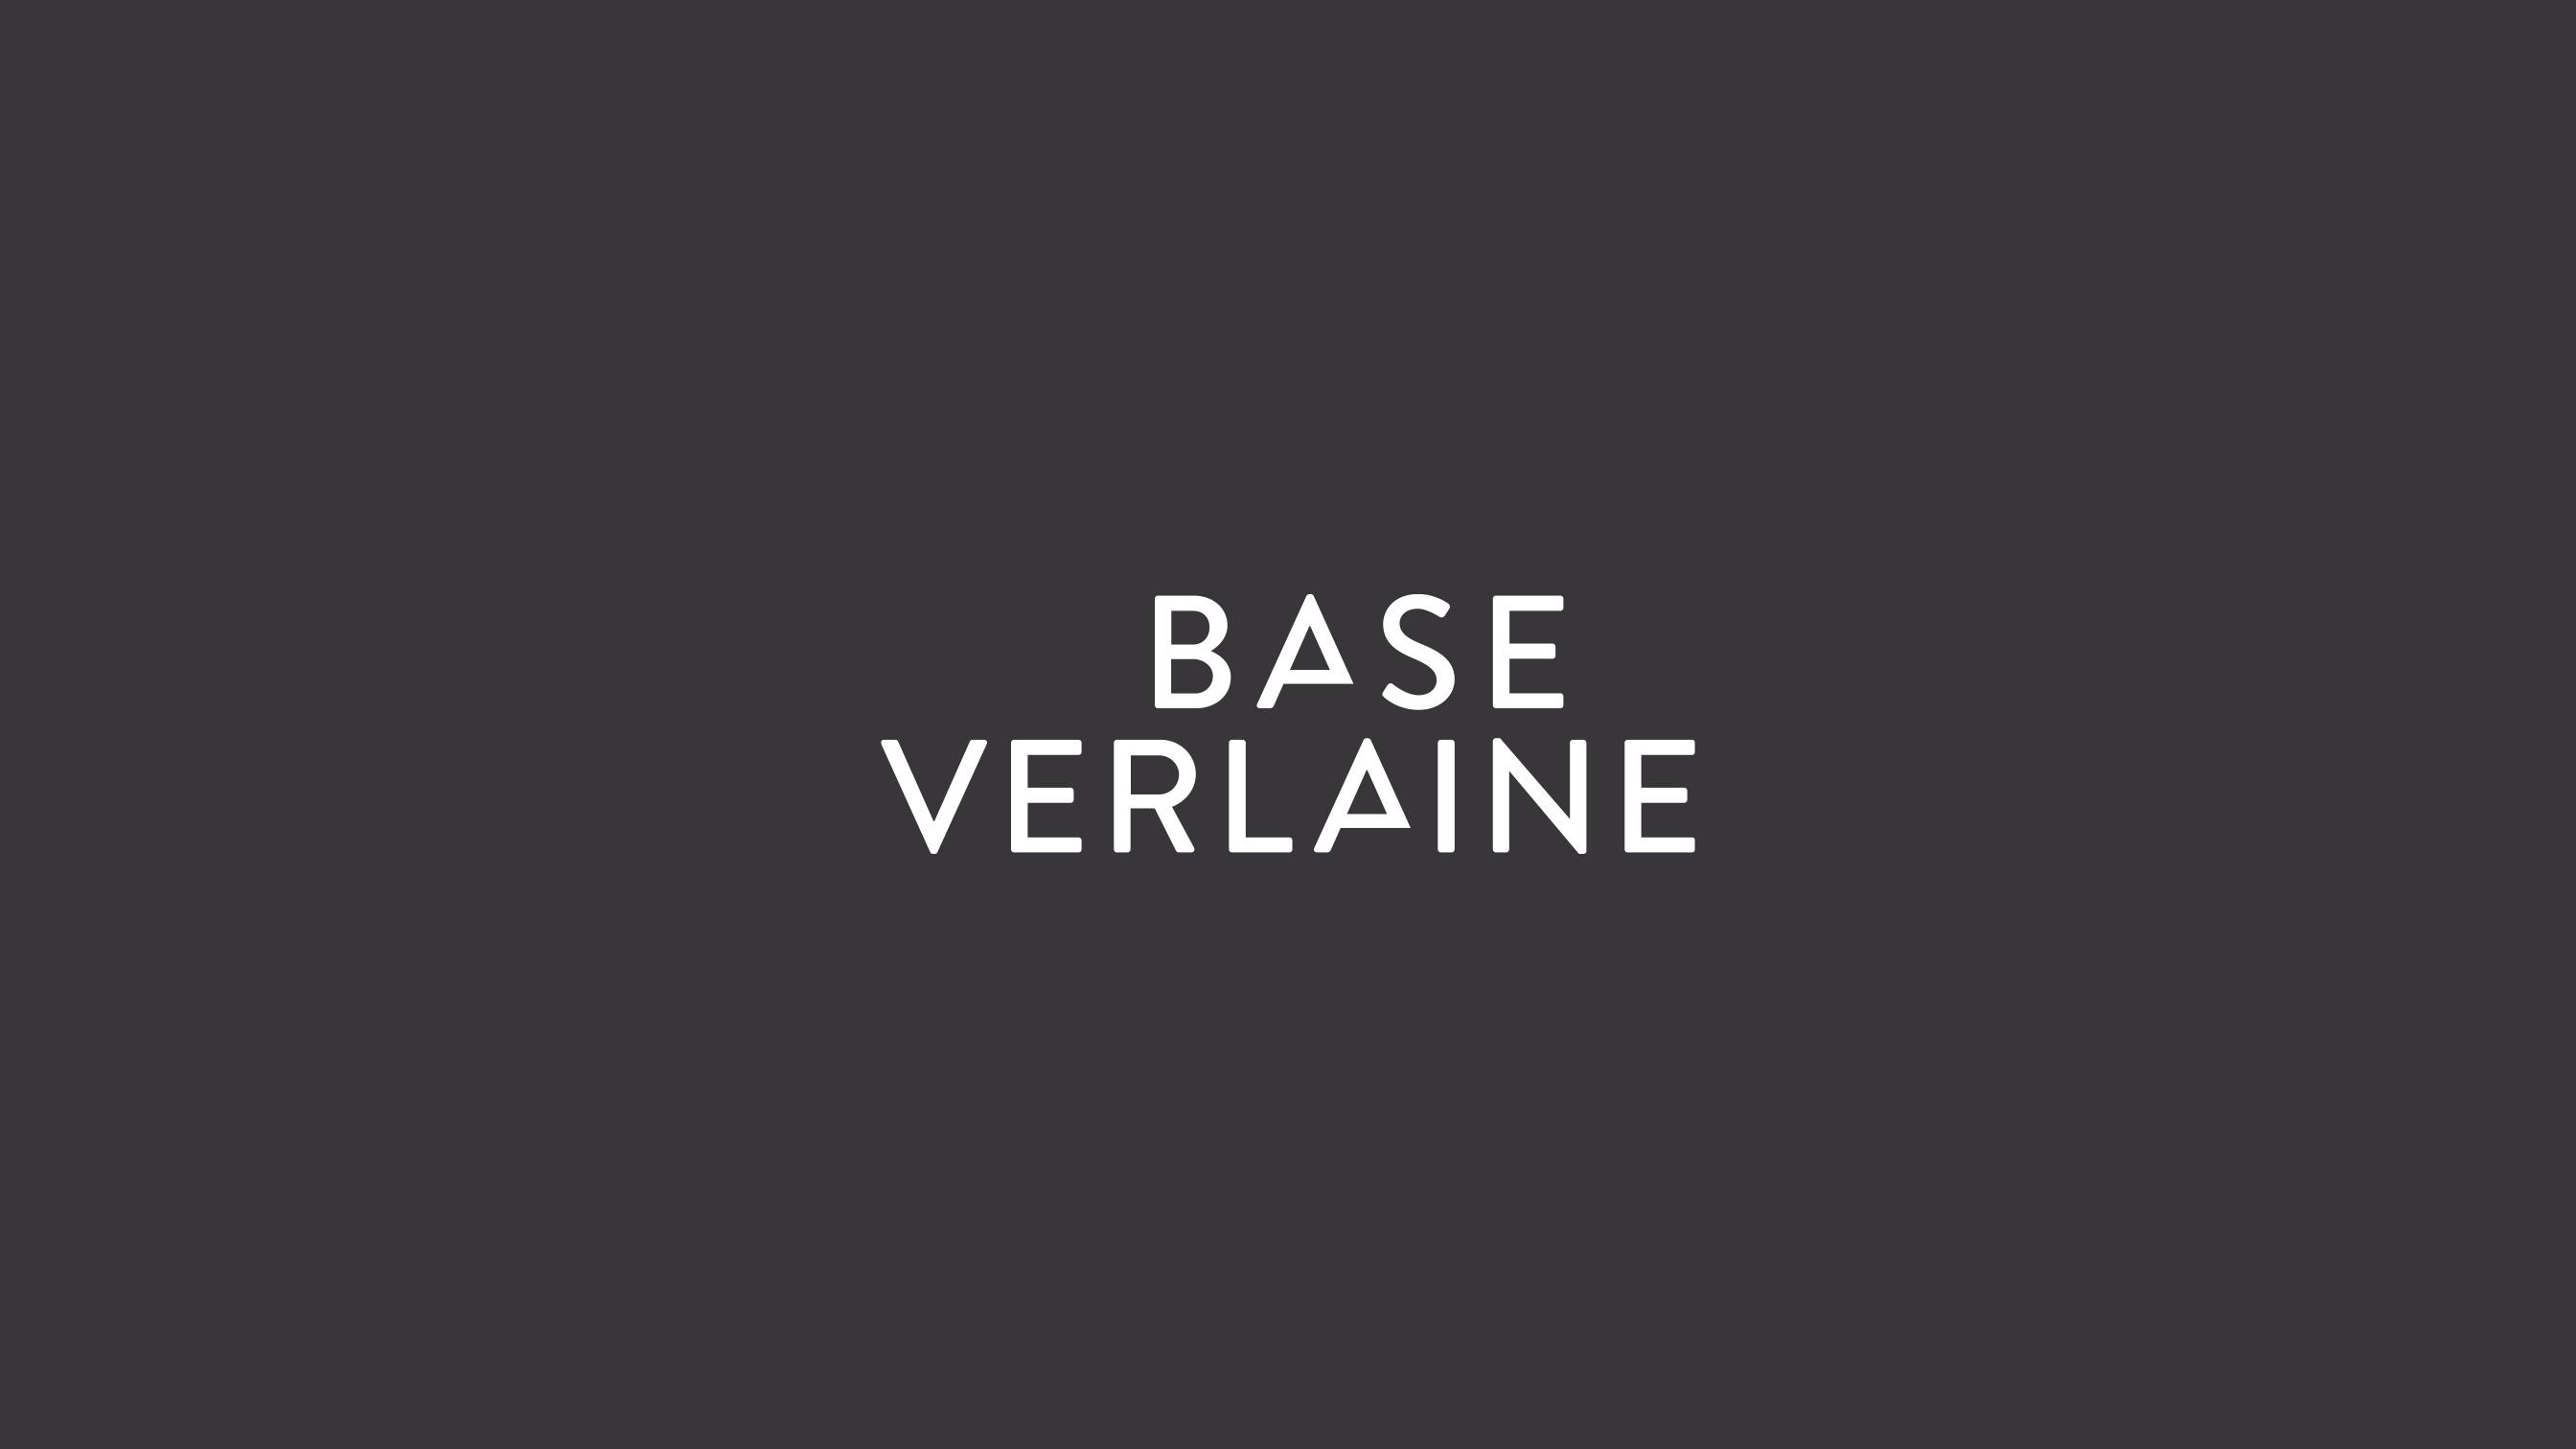 02-base-verlaine-pikteo-webdesign-graphic-design-freelance-paris-bruxelles-londres